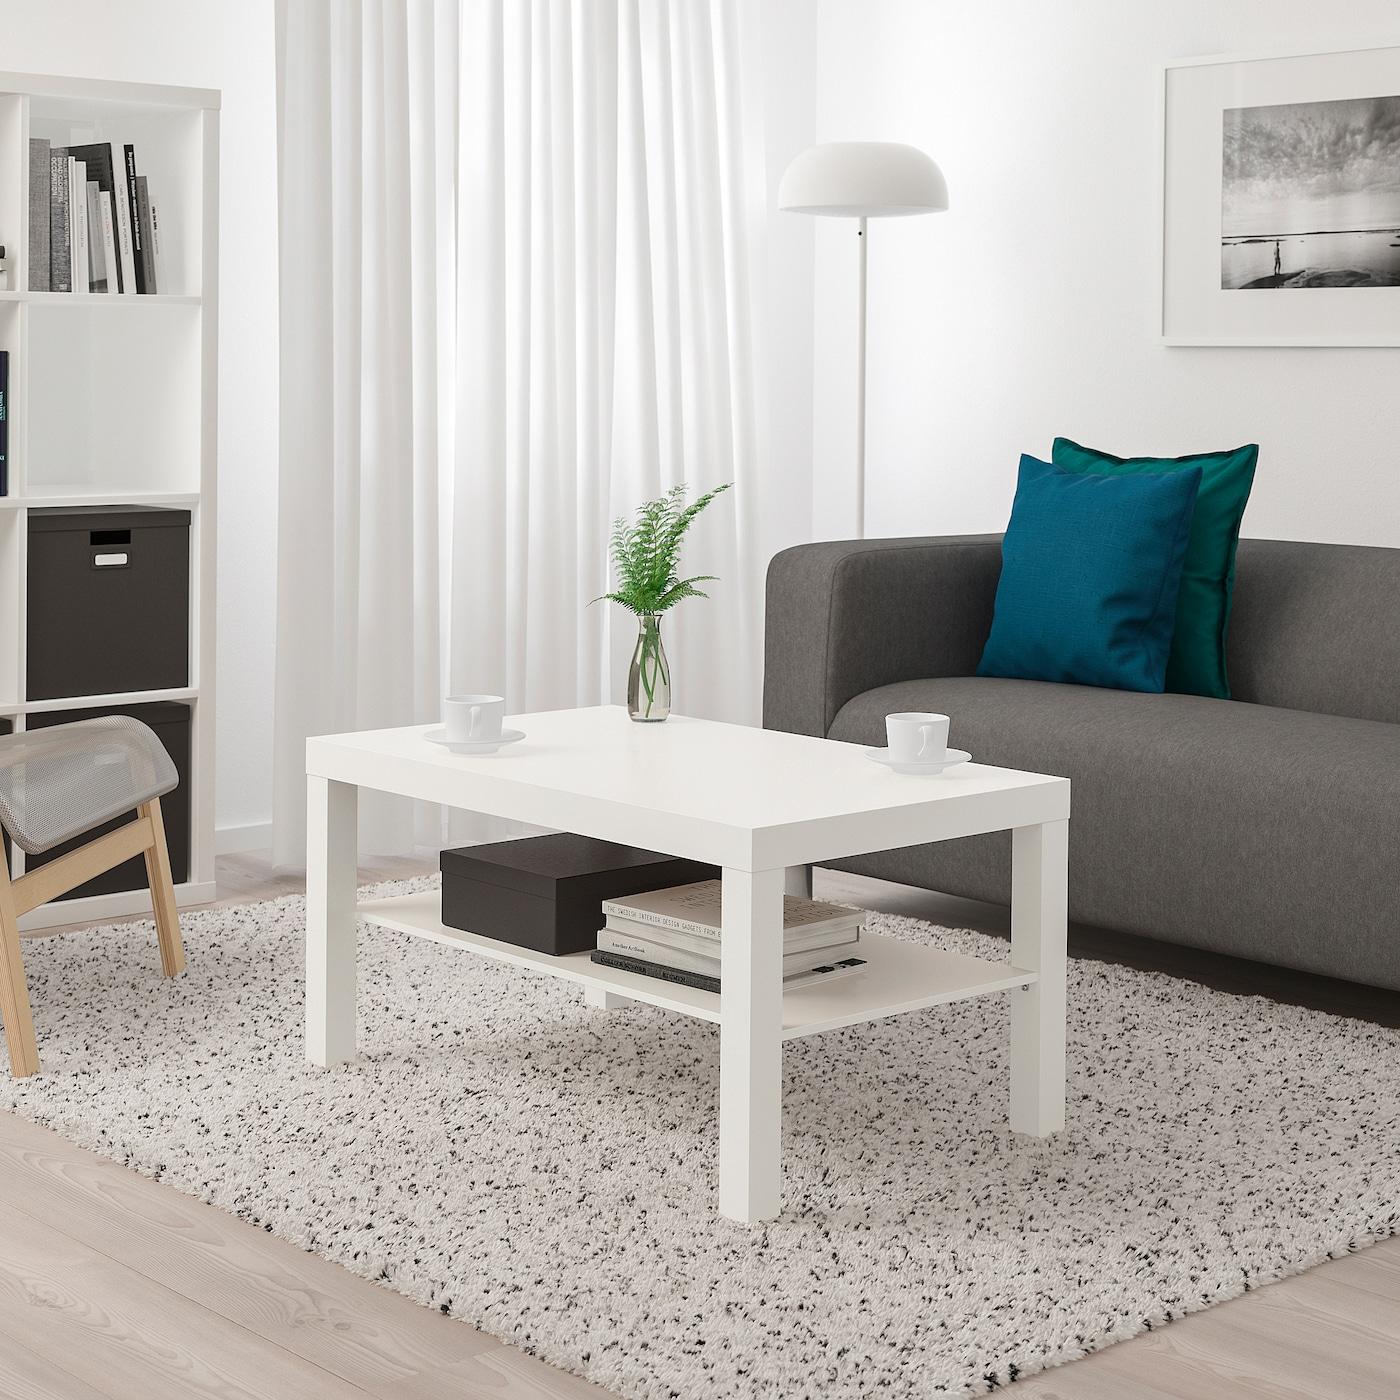 Lack Coffee Table White 35x22x18 90x55 Cm Ikea [ 1400 x 1400 Pixel ]